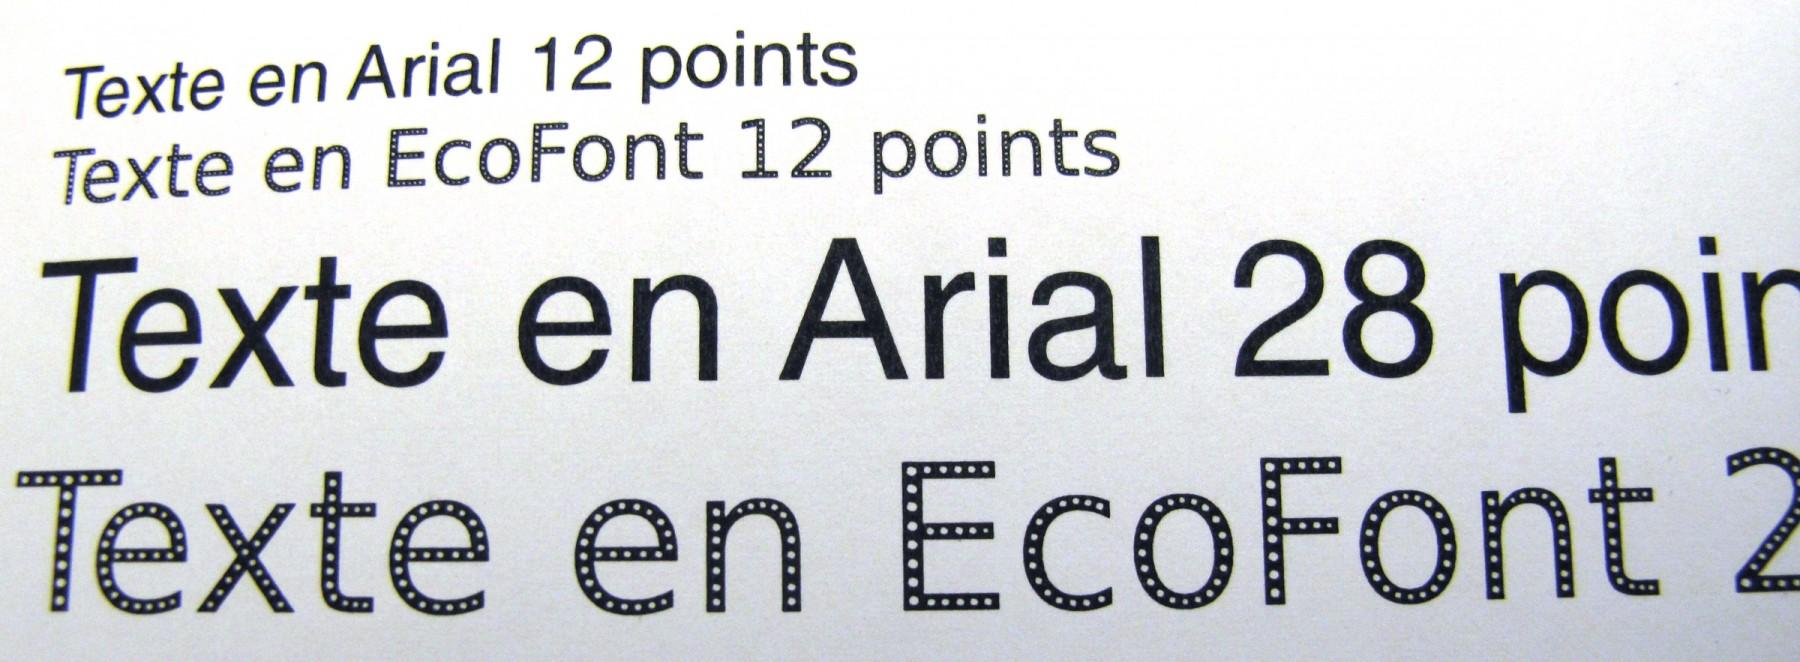 ecofont-vs-arial-test